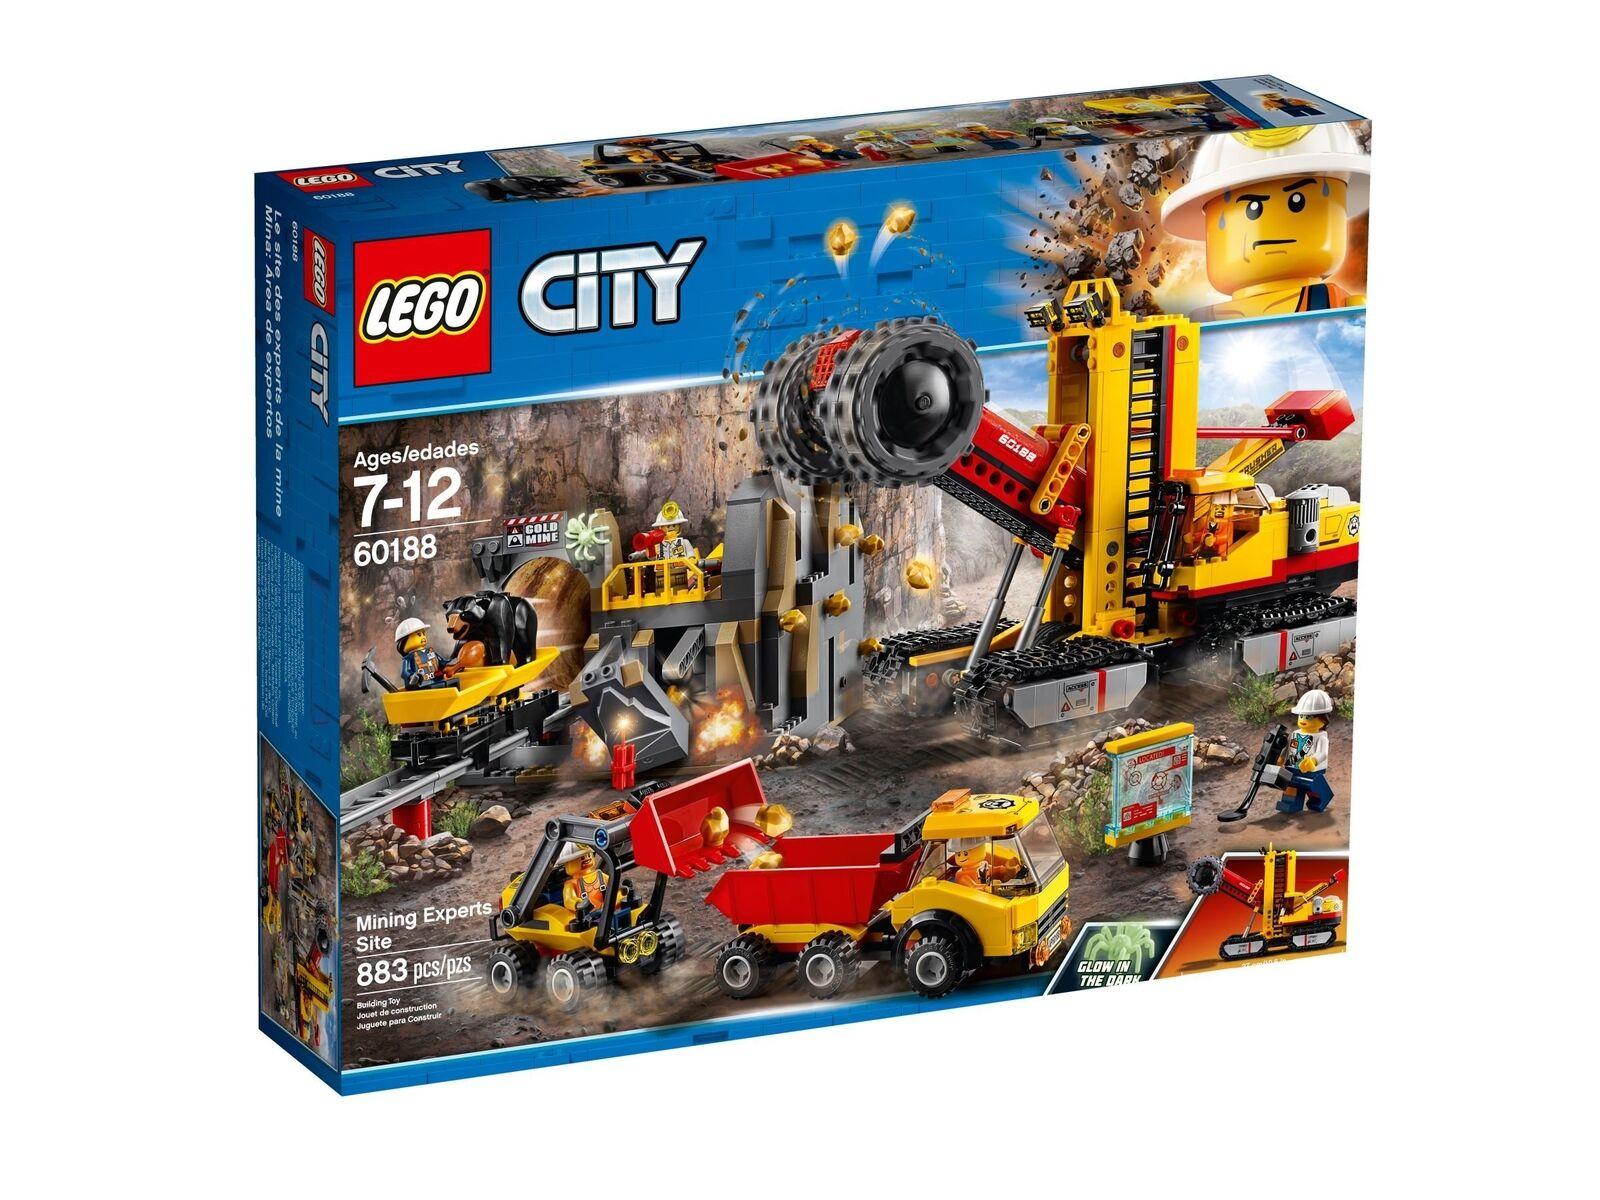 Lego City 60188 Bergbauprofis à la Abbaustätte Neuf Emballage D'Origine Misb